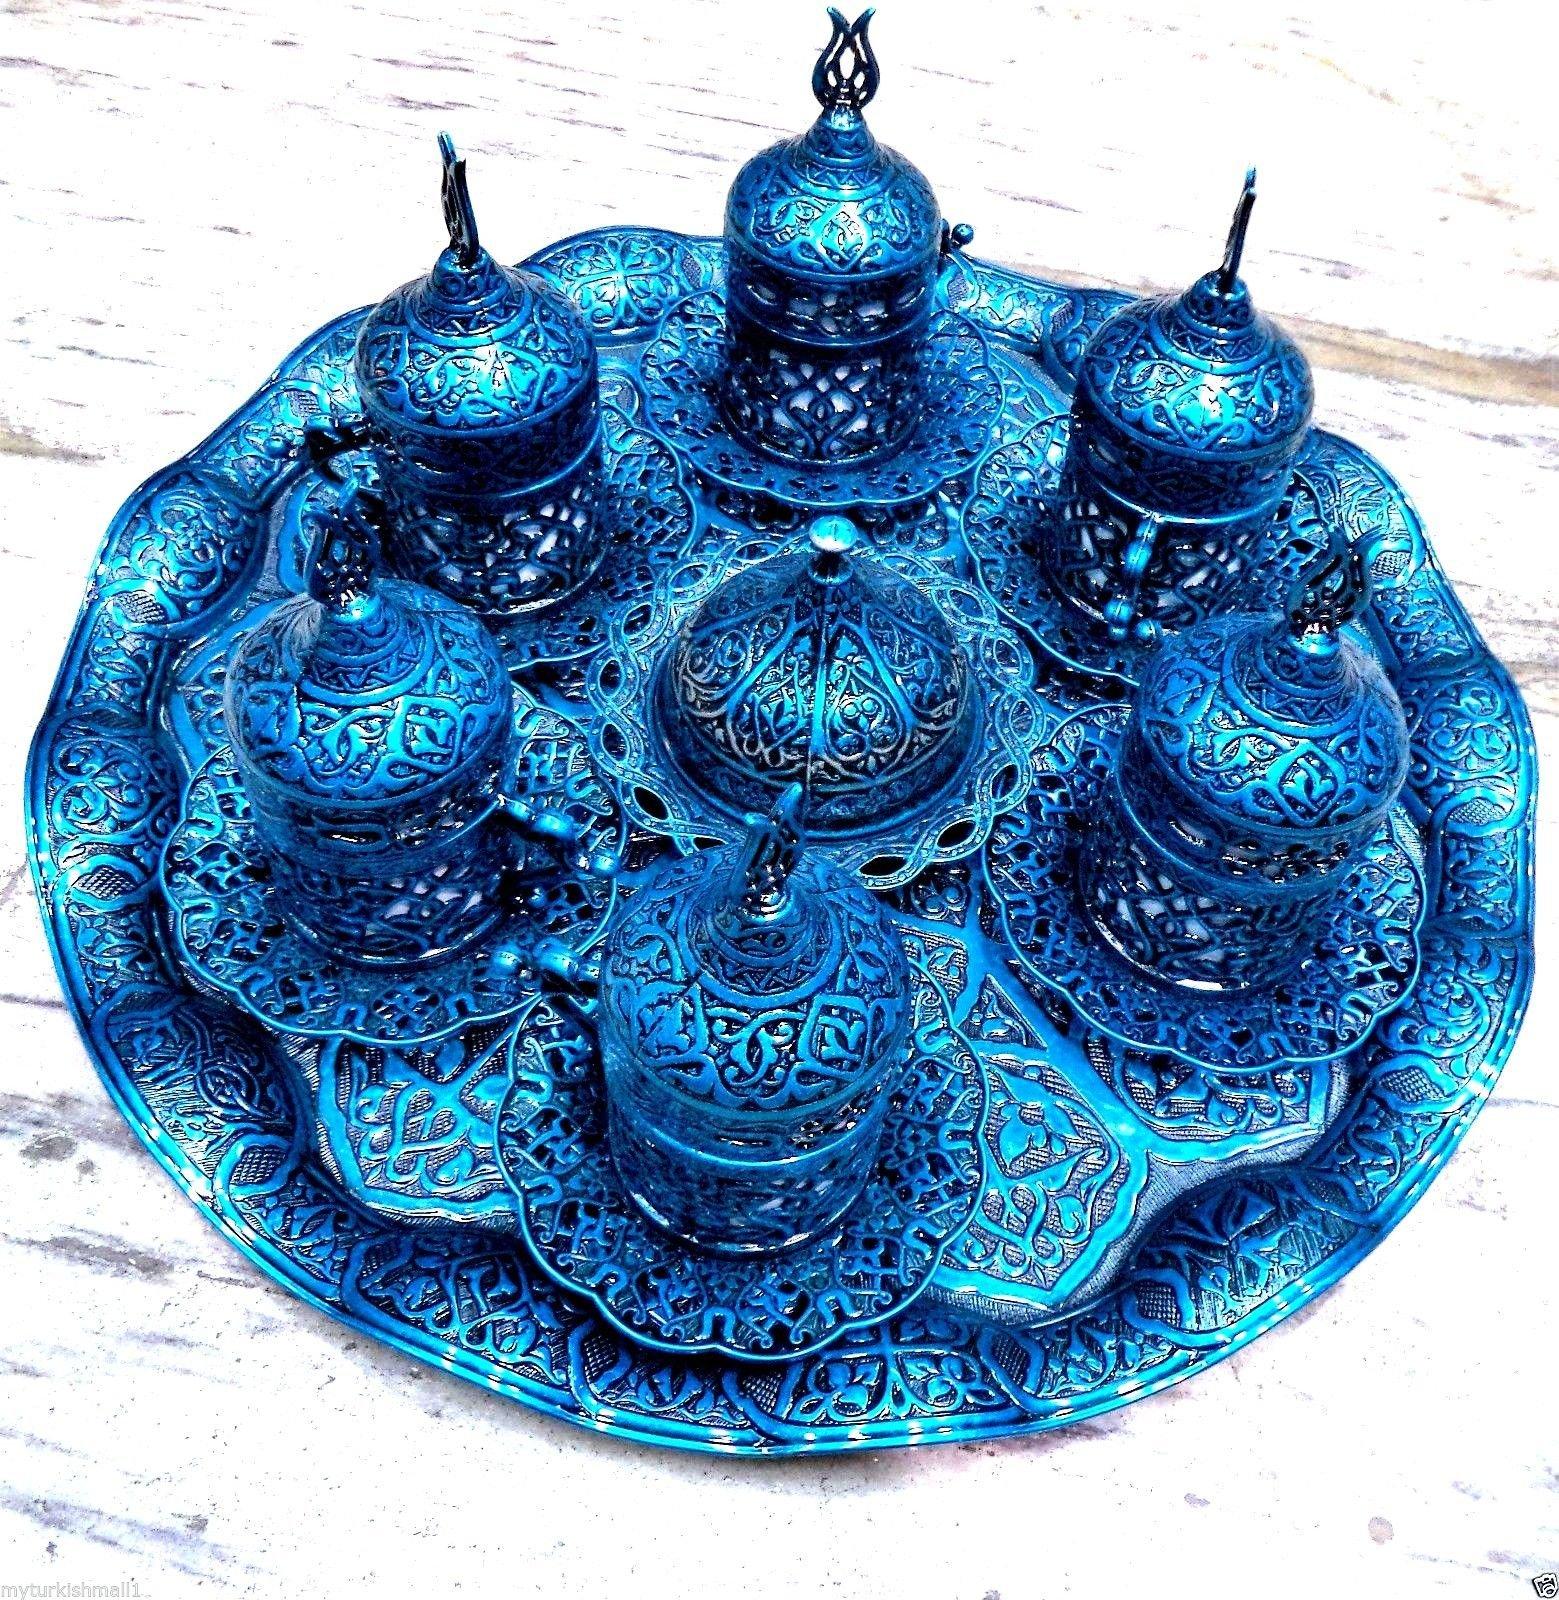 Handmade Copper and Porcelain Turkish Ottoman Coffee Espresso Set 27 Pcs ( Blue )